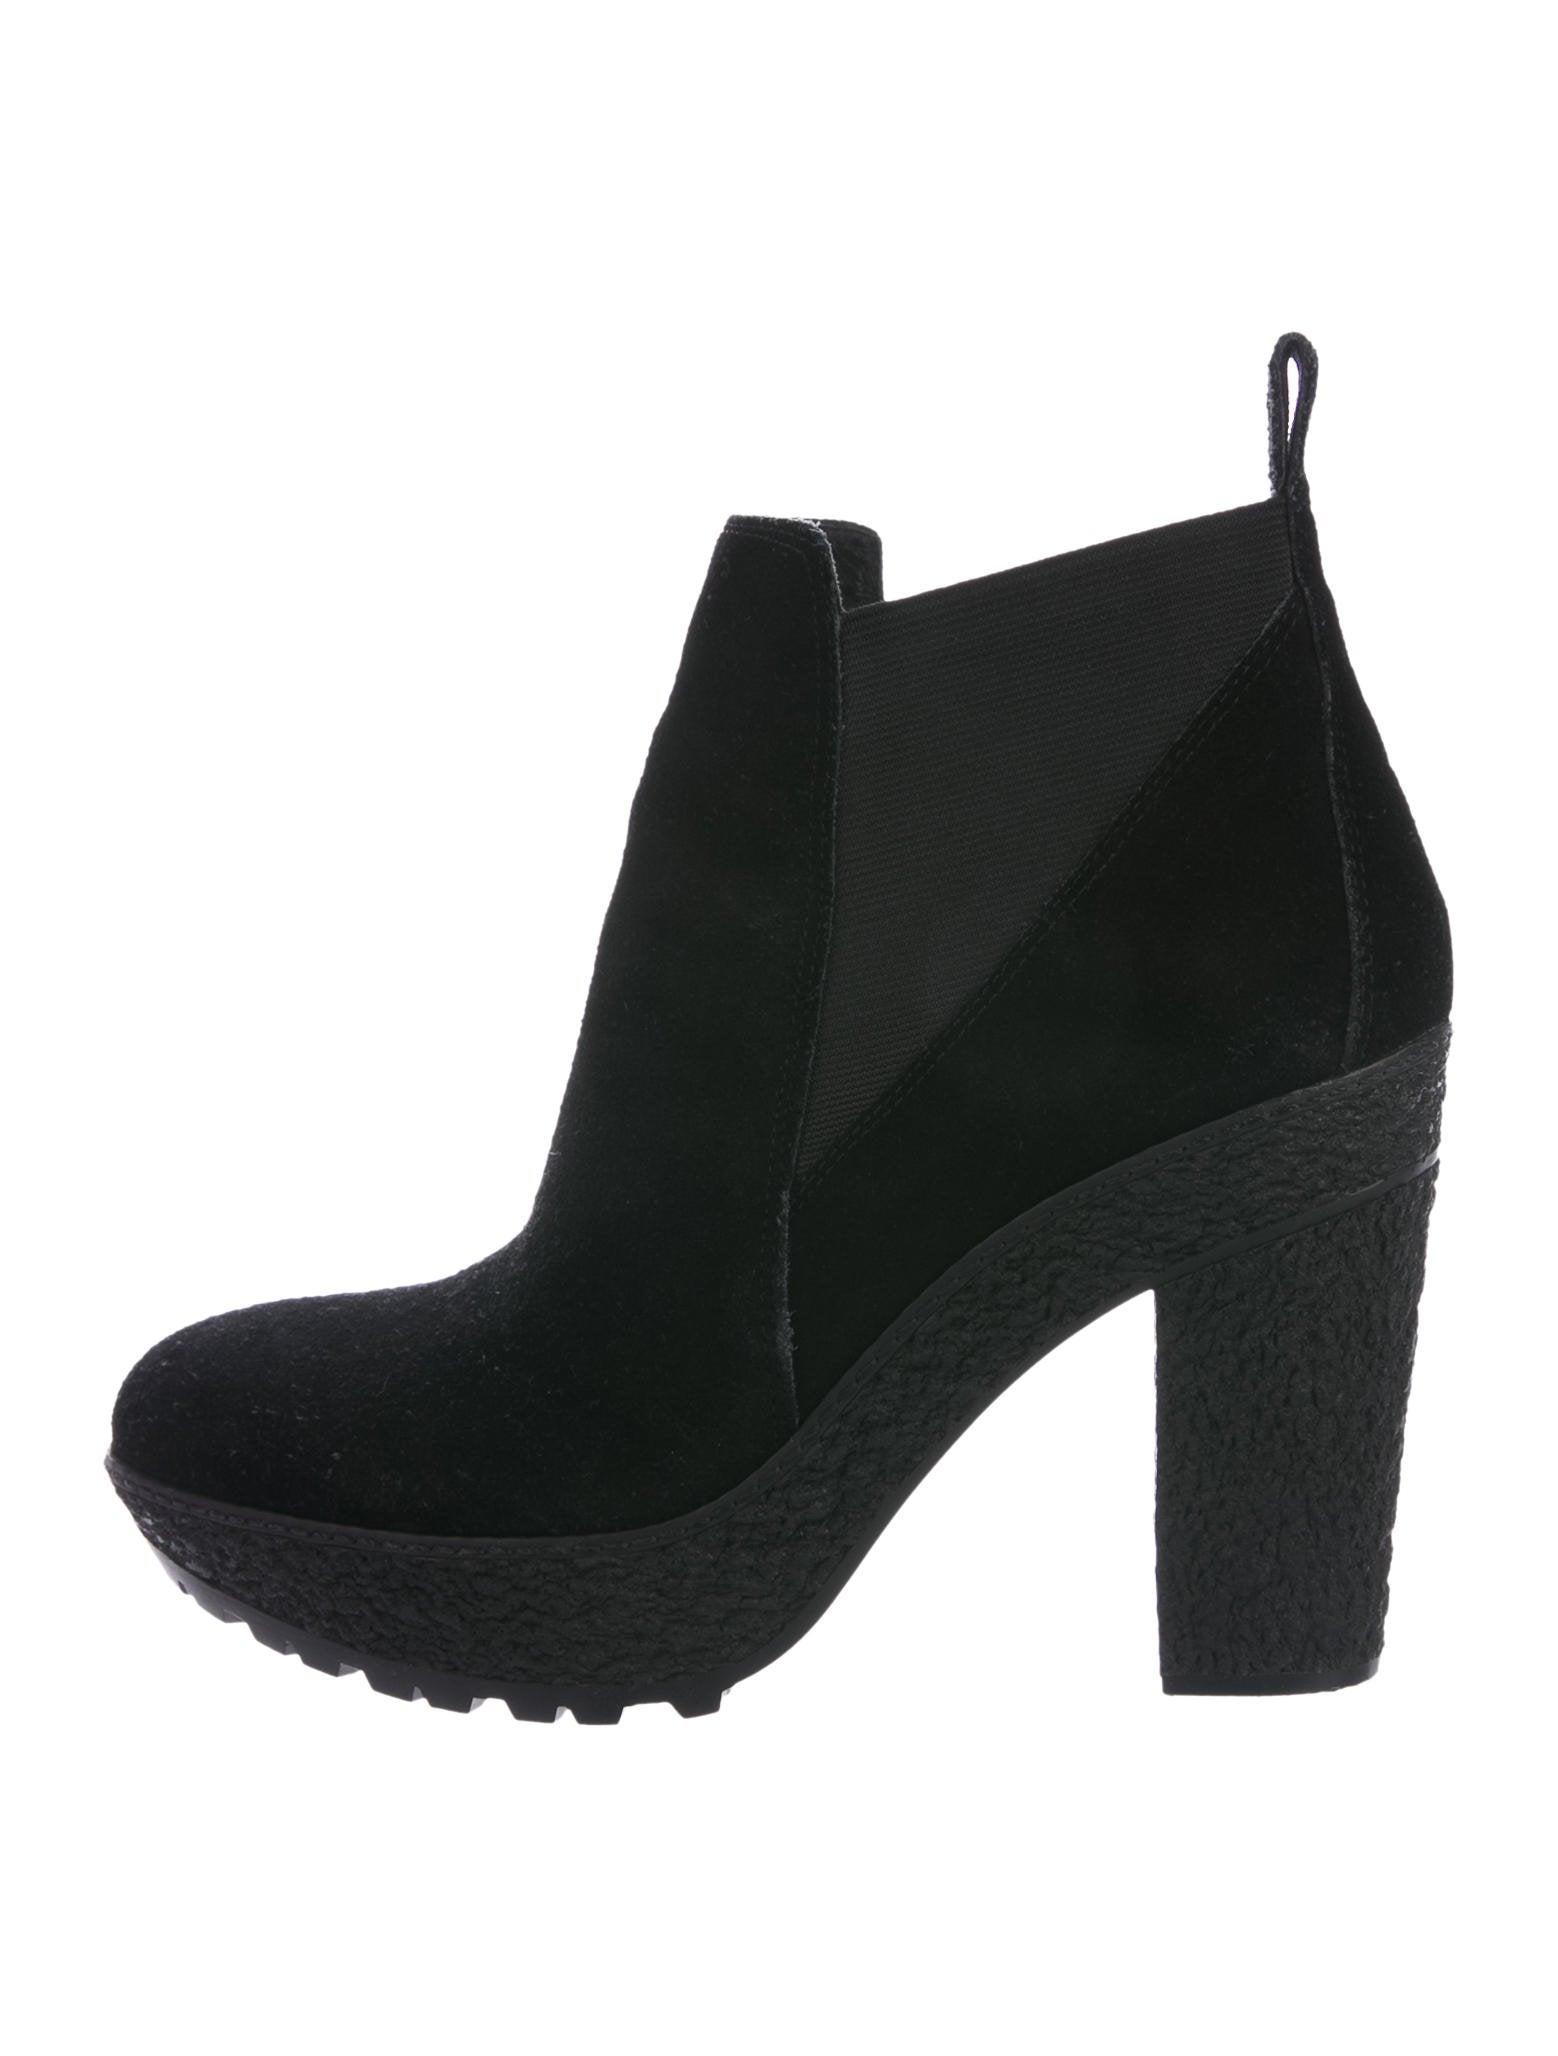 Diane von Furstenberg Suede Platform Ankle Boots sale limited edition sast outlet official site reliable sale online extremely j596yjPEX